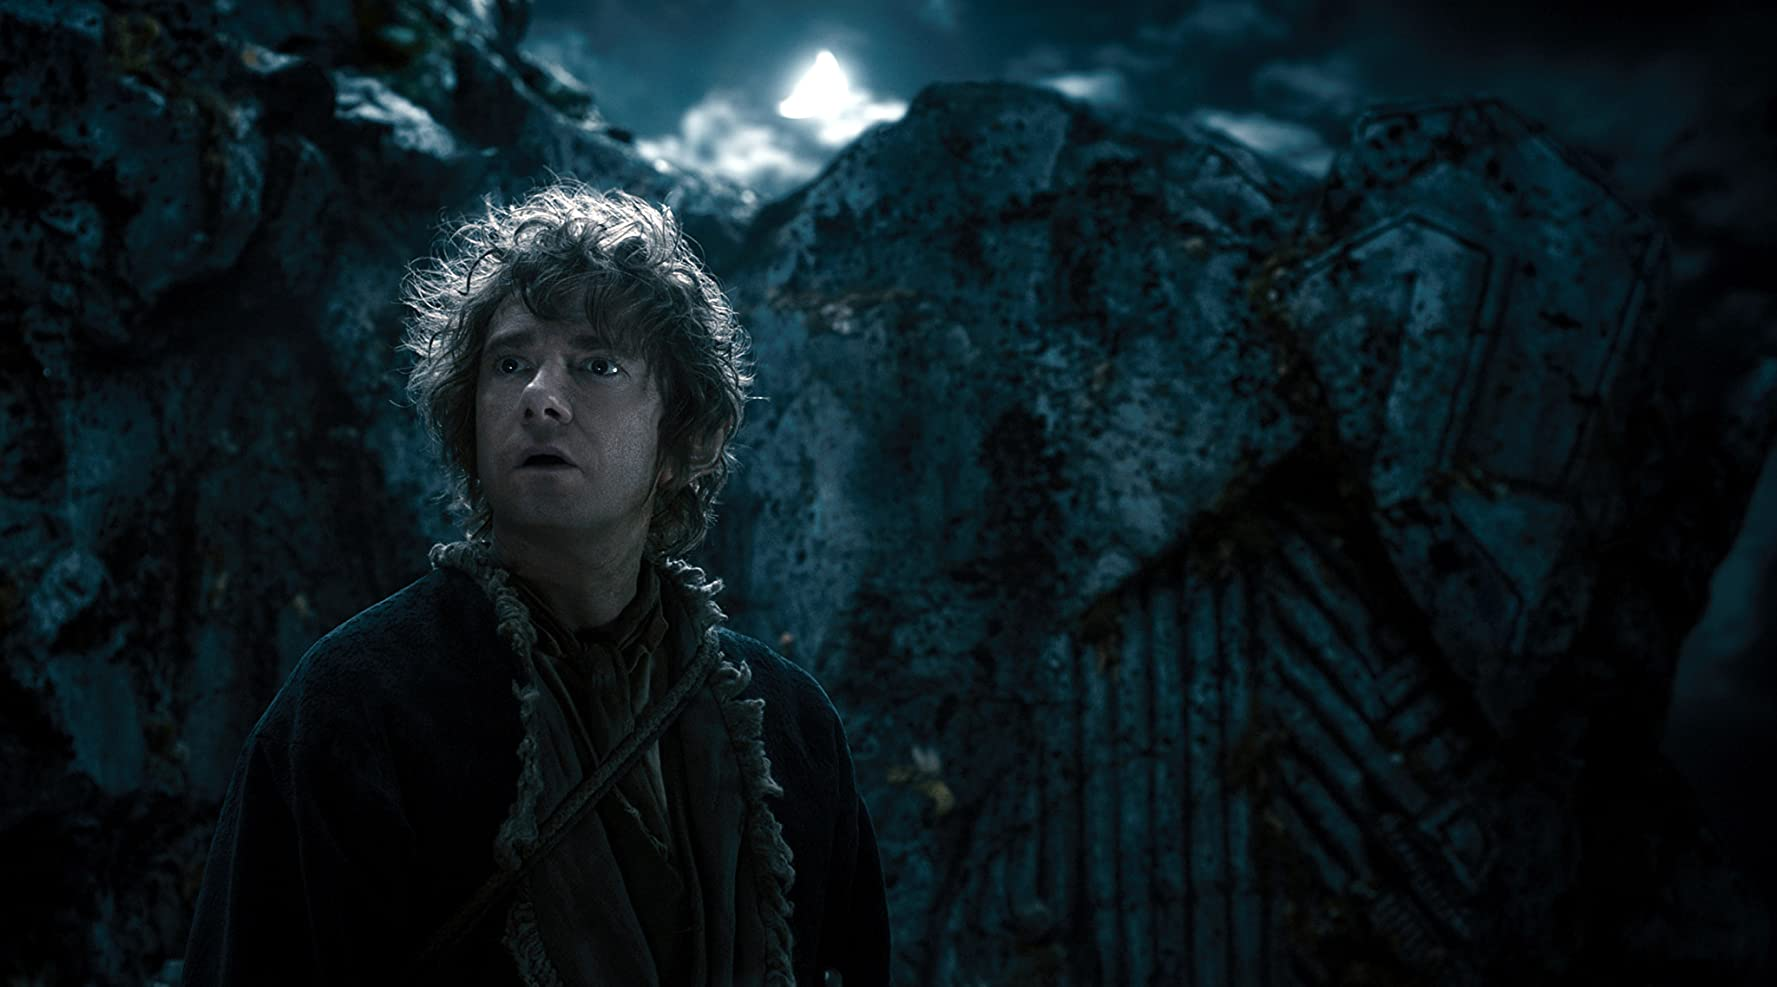 Martin Freeman in The Hobbit: The Desolation of Smaug (2013)